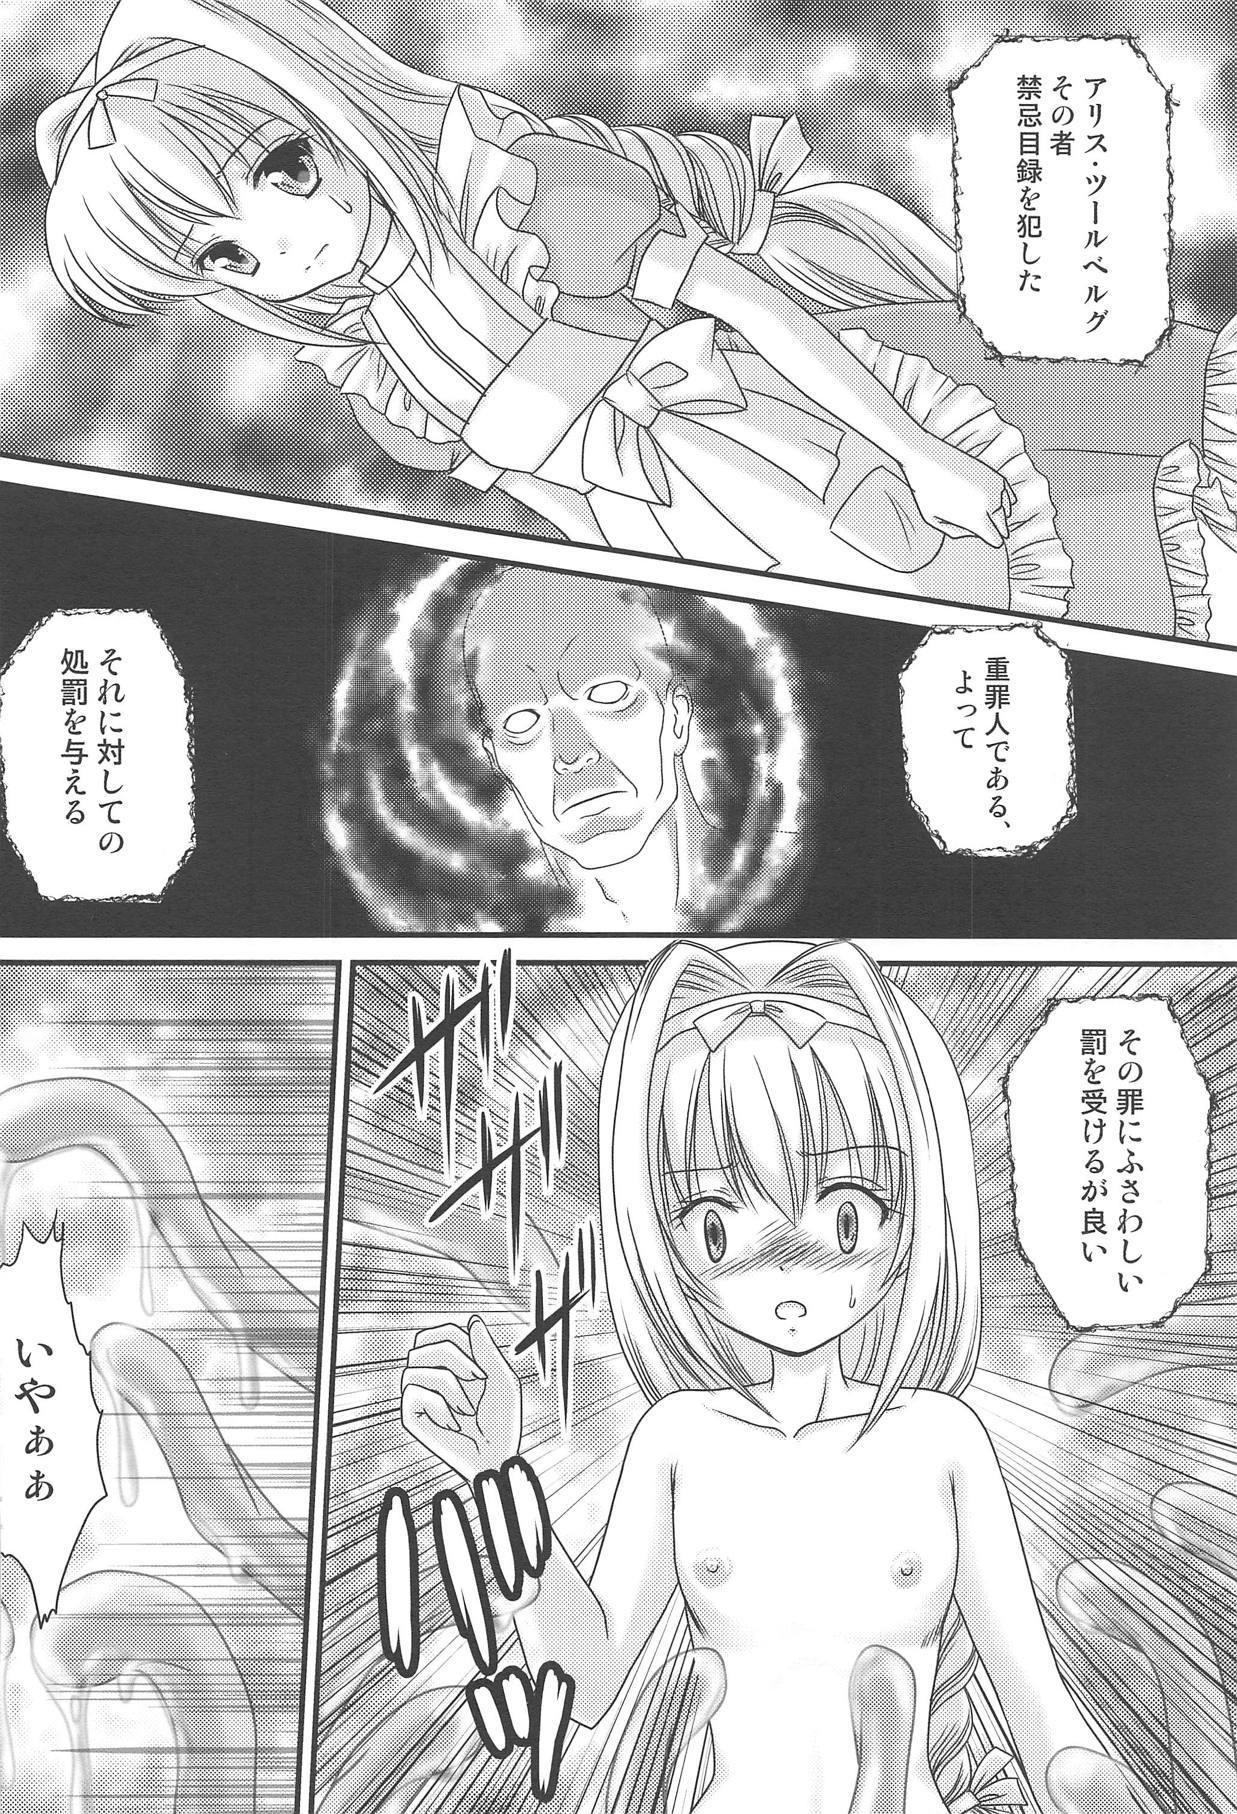 (C95) [TRAP (Urano Mami)] SAO ~sokoni anatato omoideto~ ETERNAL (Sword Art Online) 6